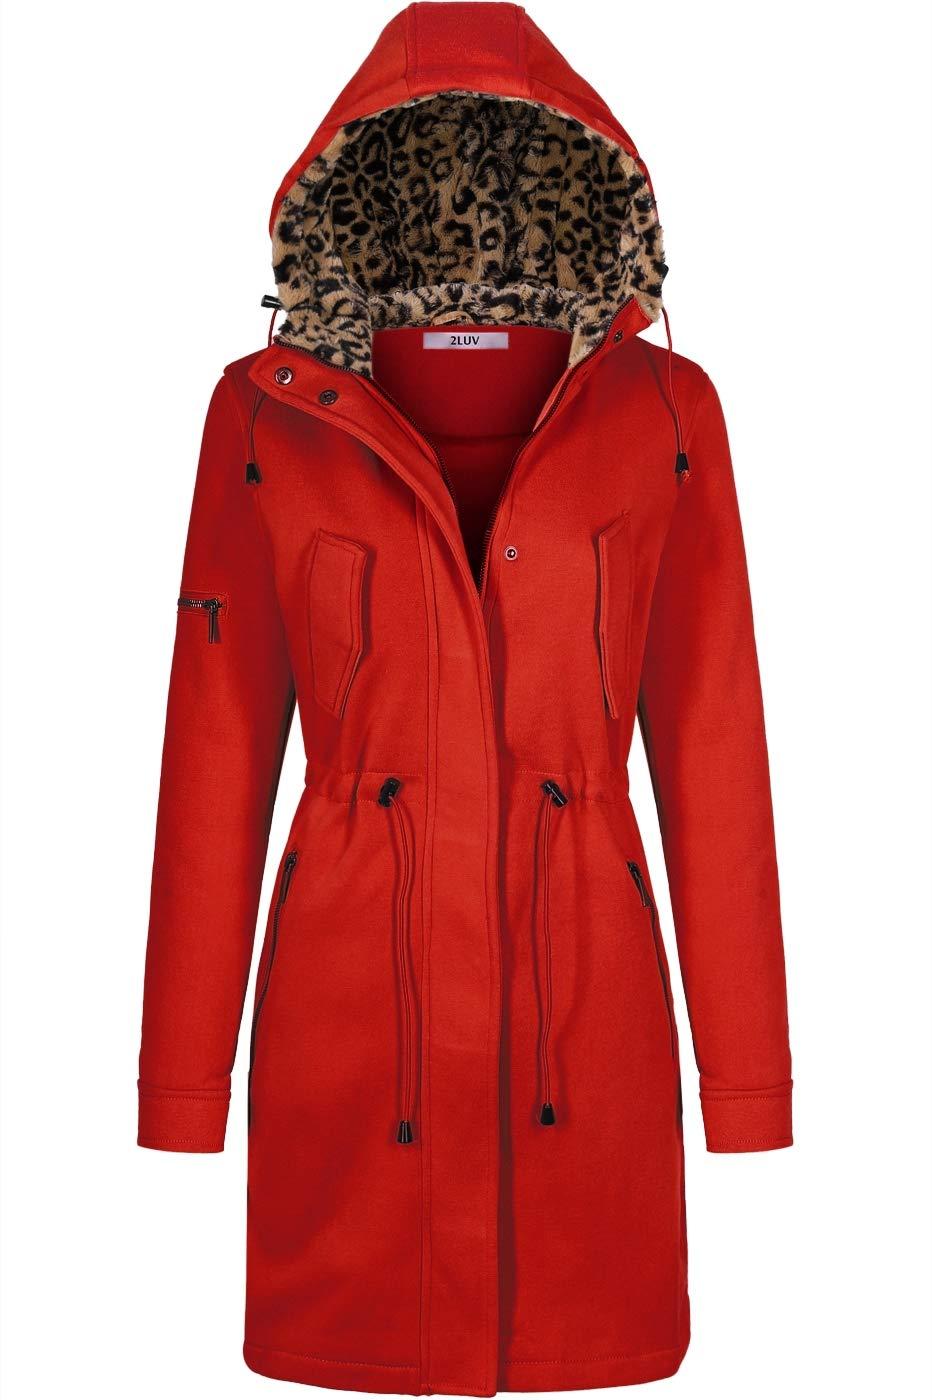 BodiLove Women's Anorak Jacket Parka Outwear with Fleece Hoodie Red L by BodiLove